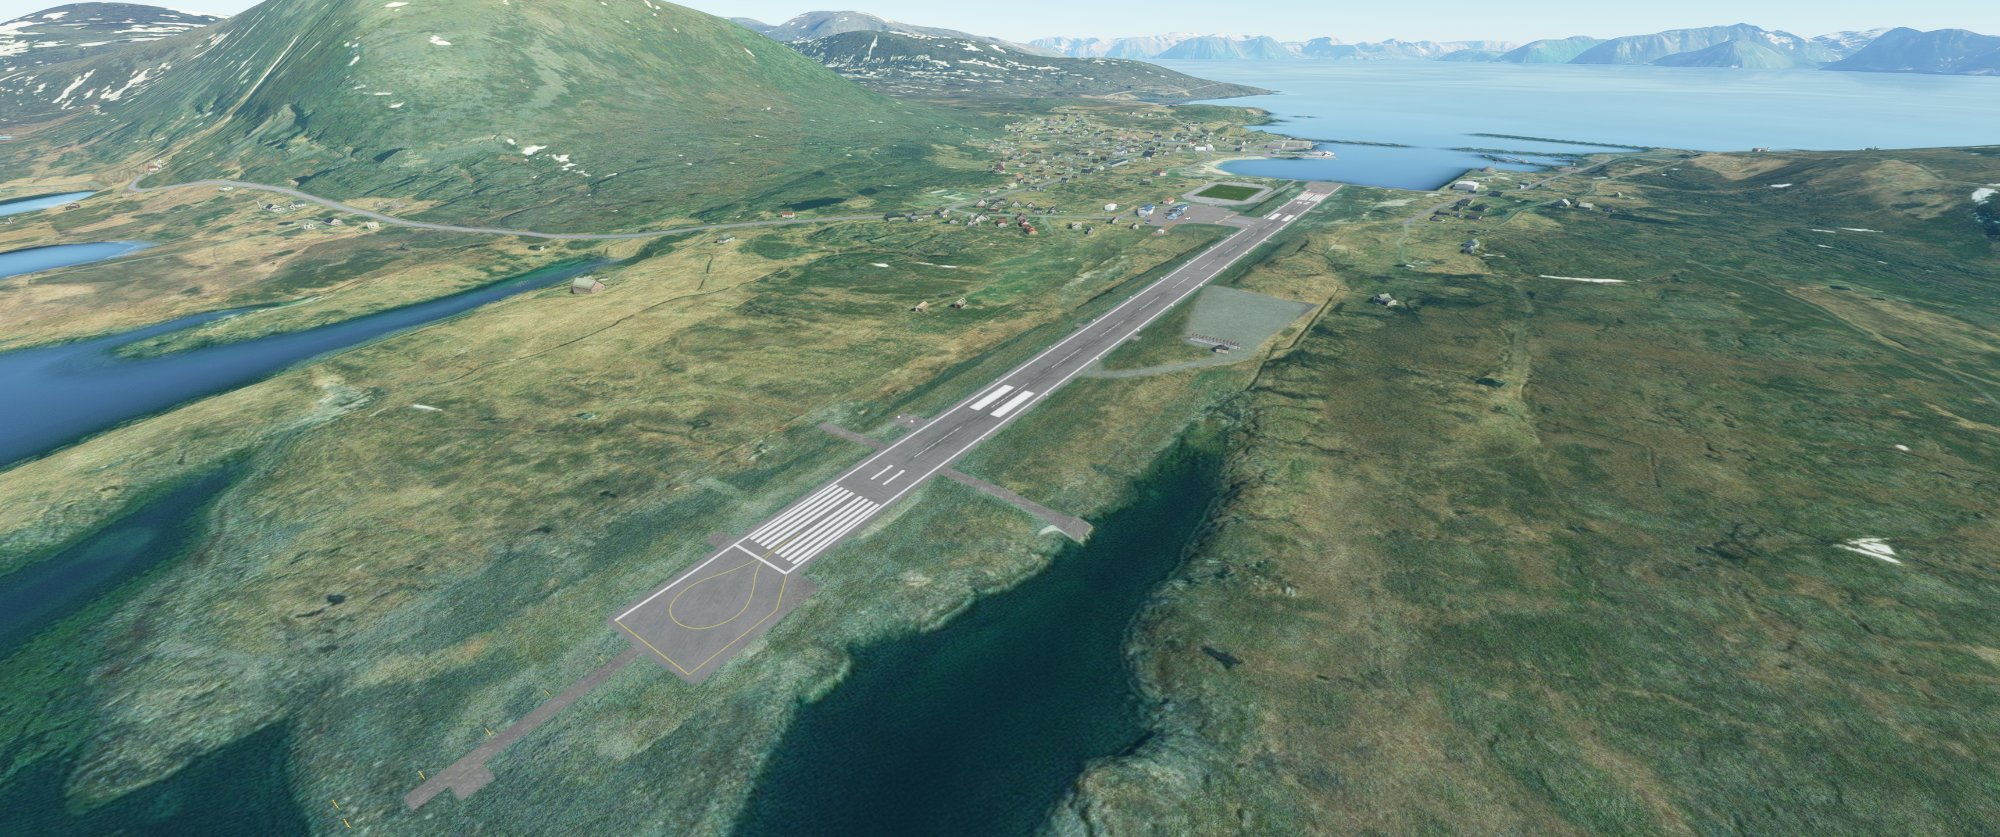 Microsoft Flight Simulator Screenshot 2021.04.27 - 18.07.05.02.jpg